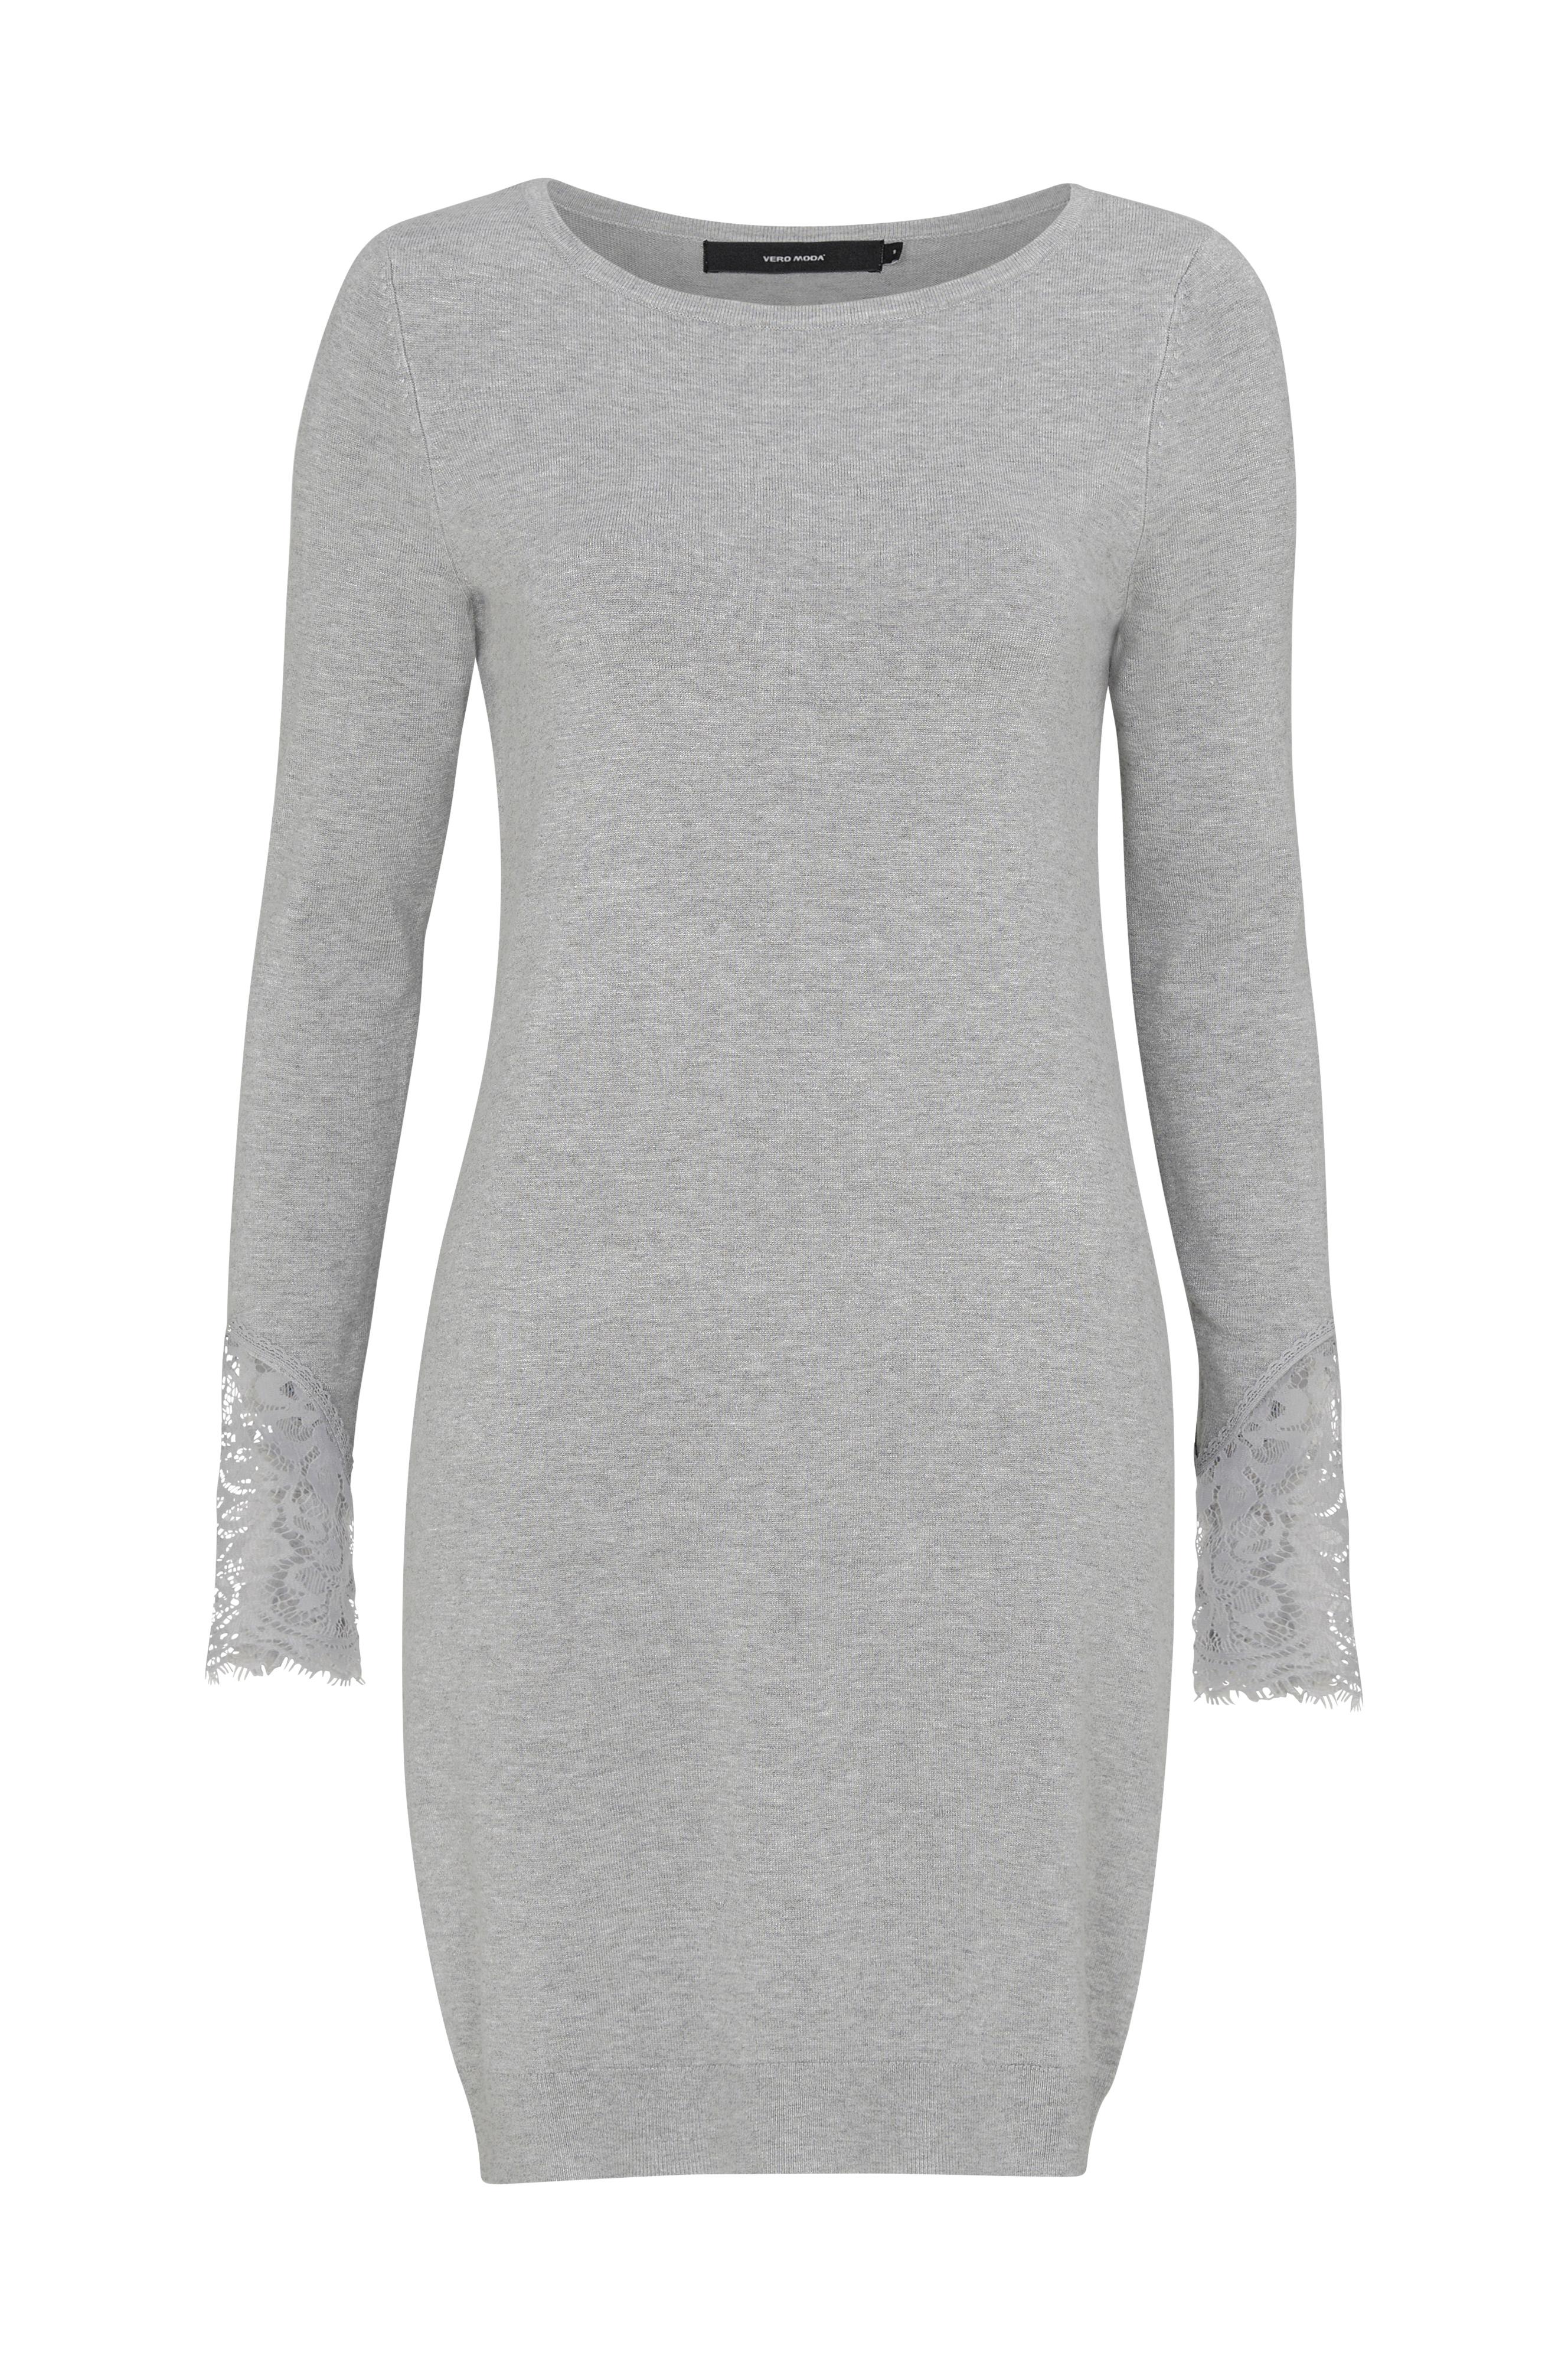 7a4d22b684ac Vero Moda Kjole vmAdo Glory LS Boatneck Dress - Grå - Dame - Ellos.no